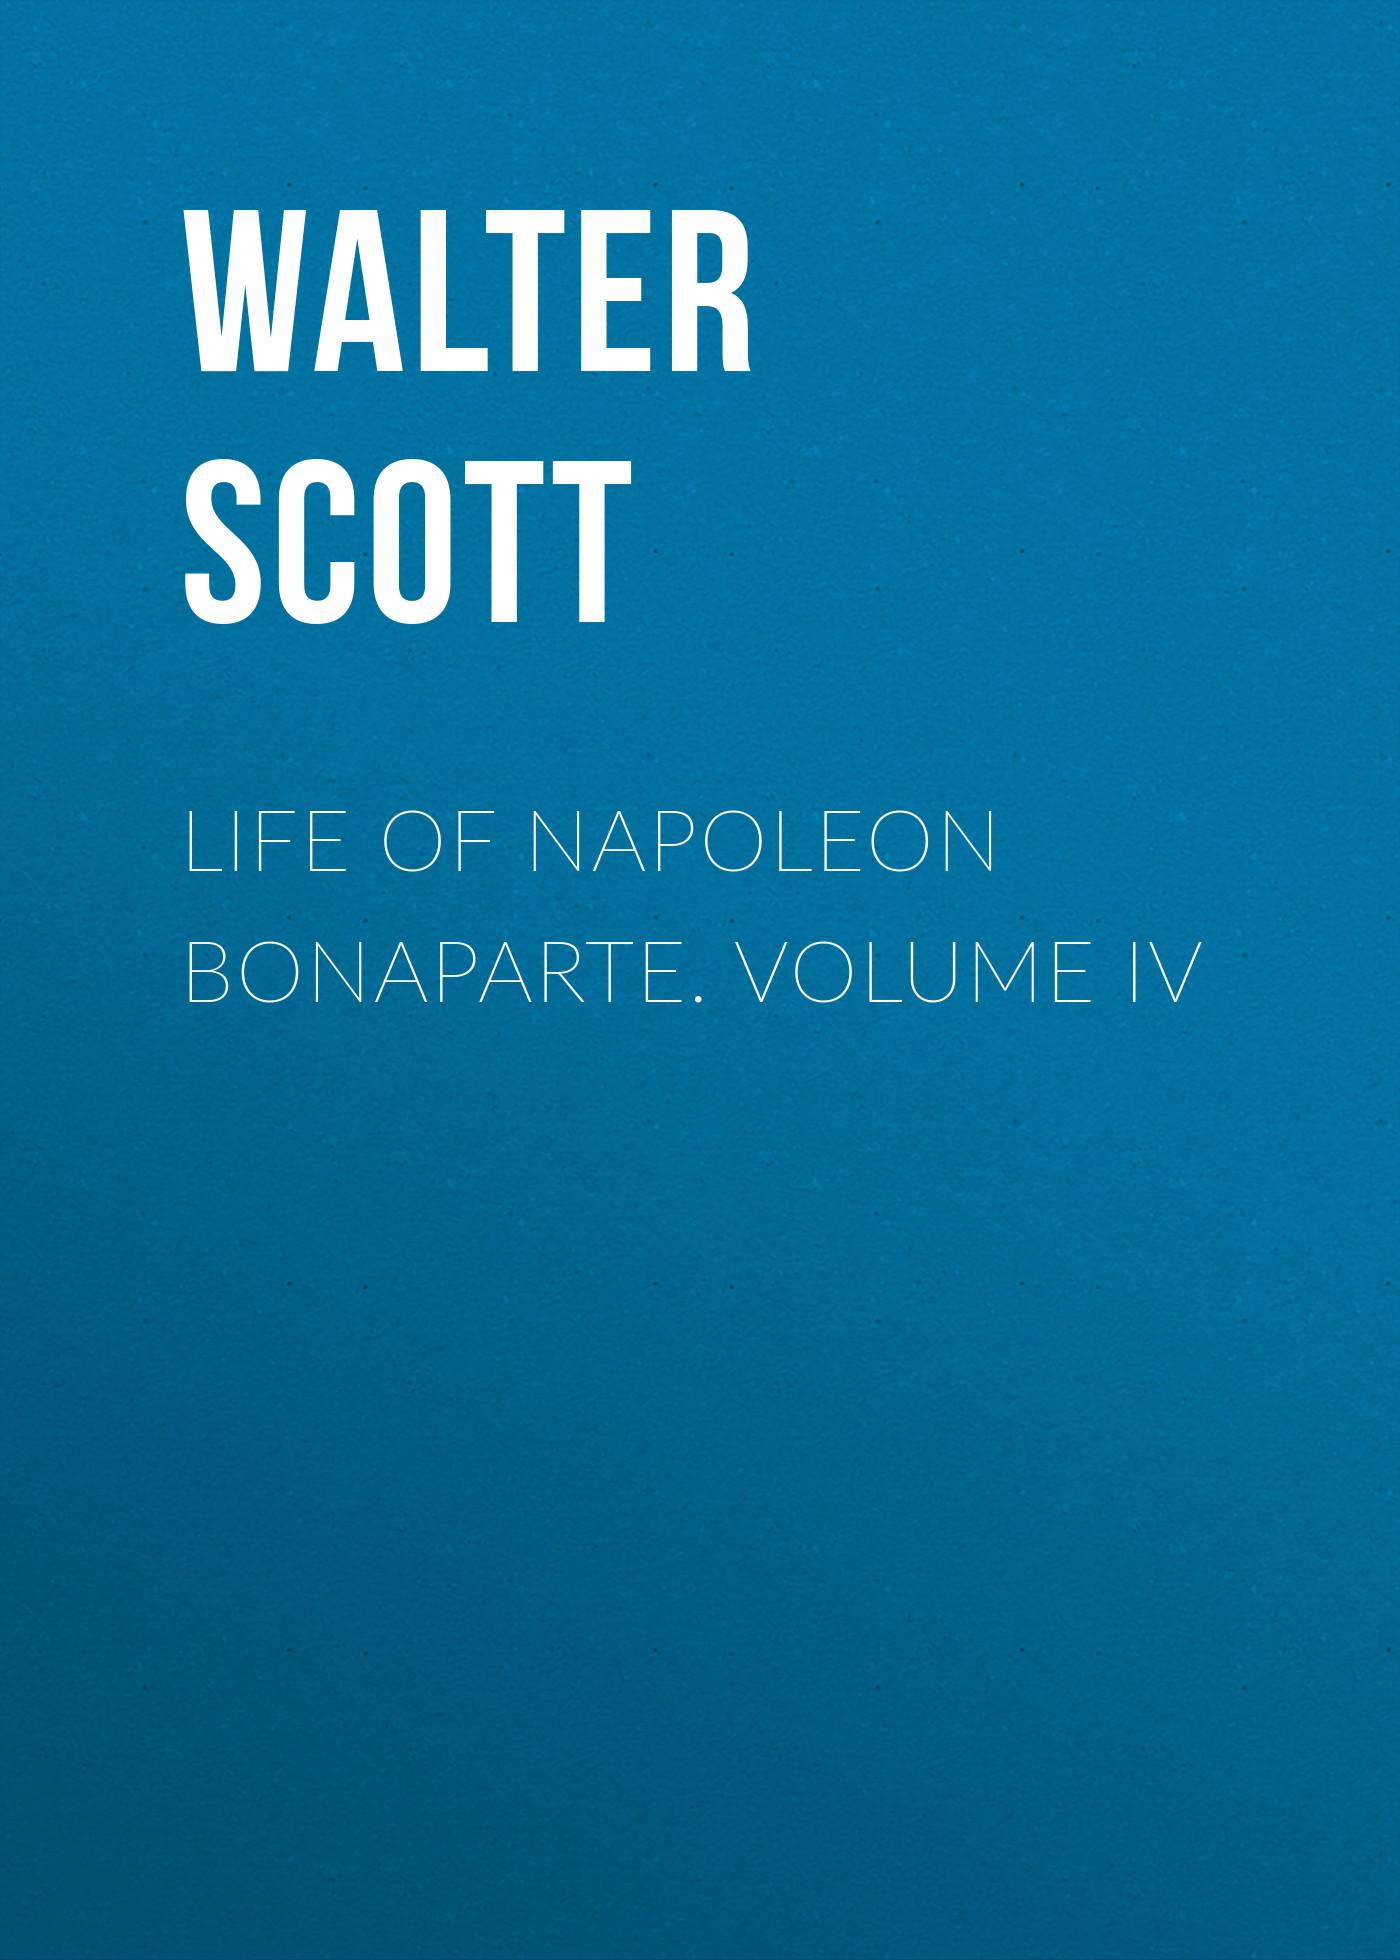 Life of Napoleon Bonaparte. Volume IV